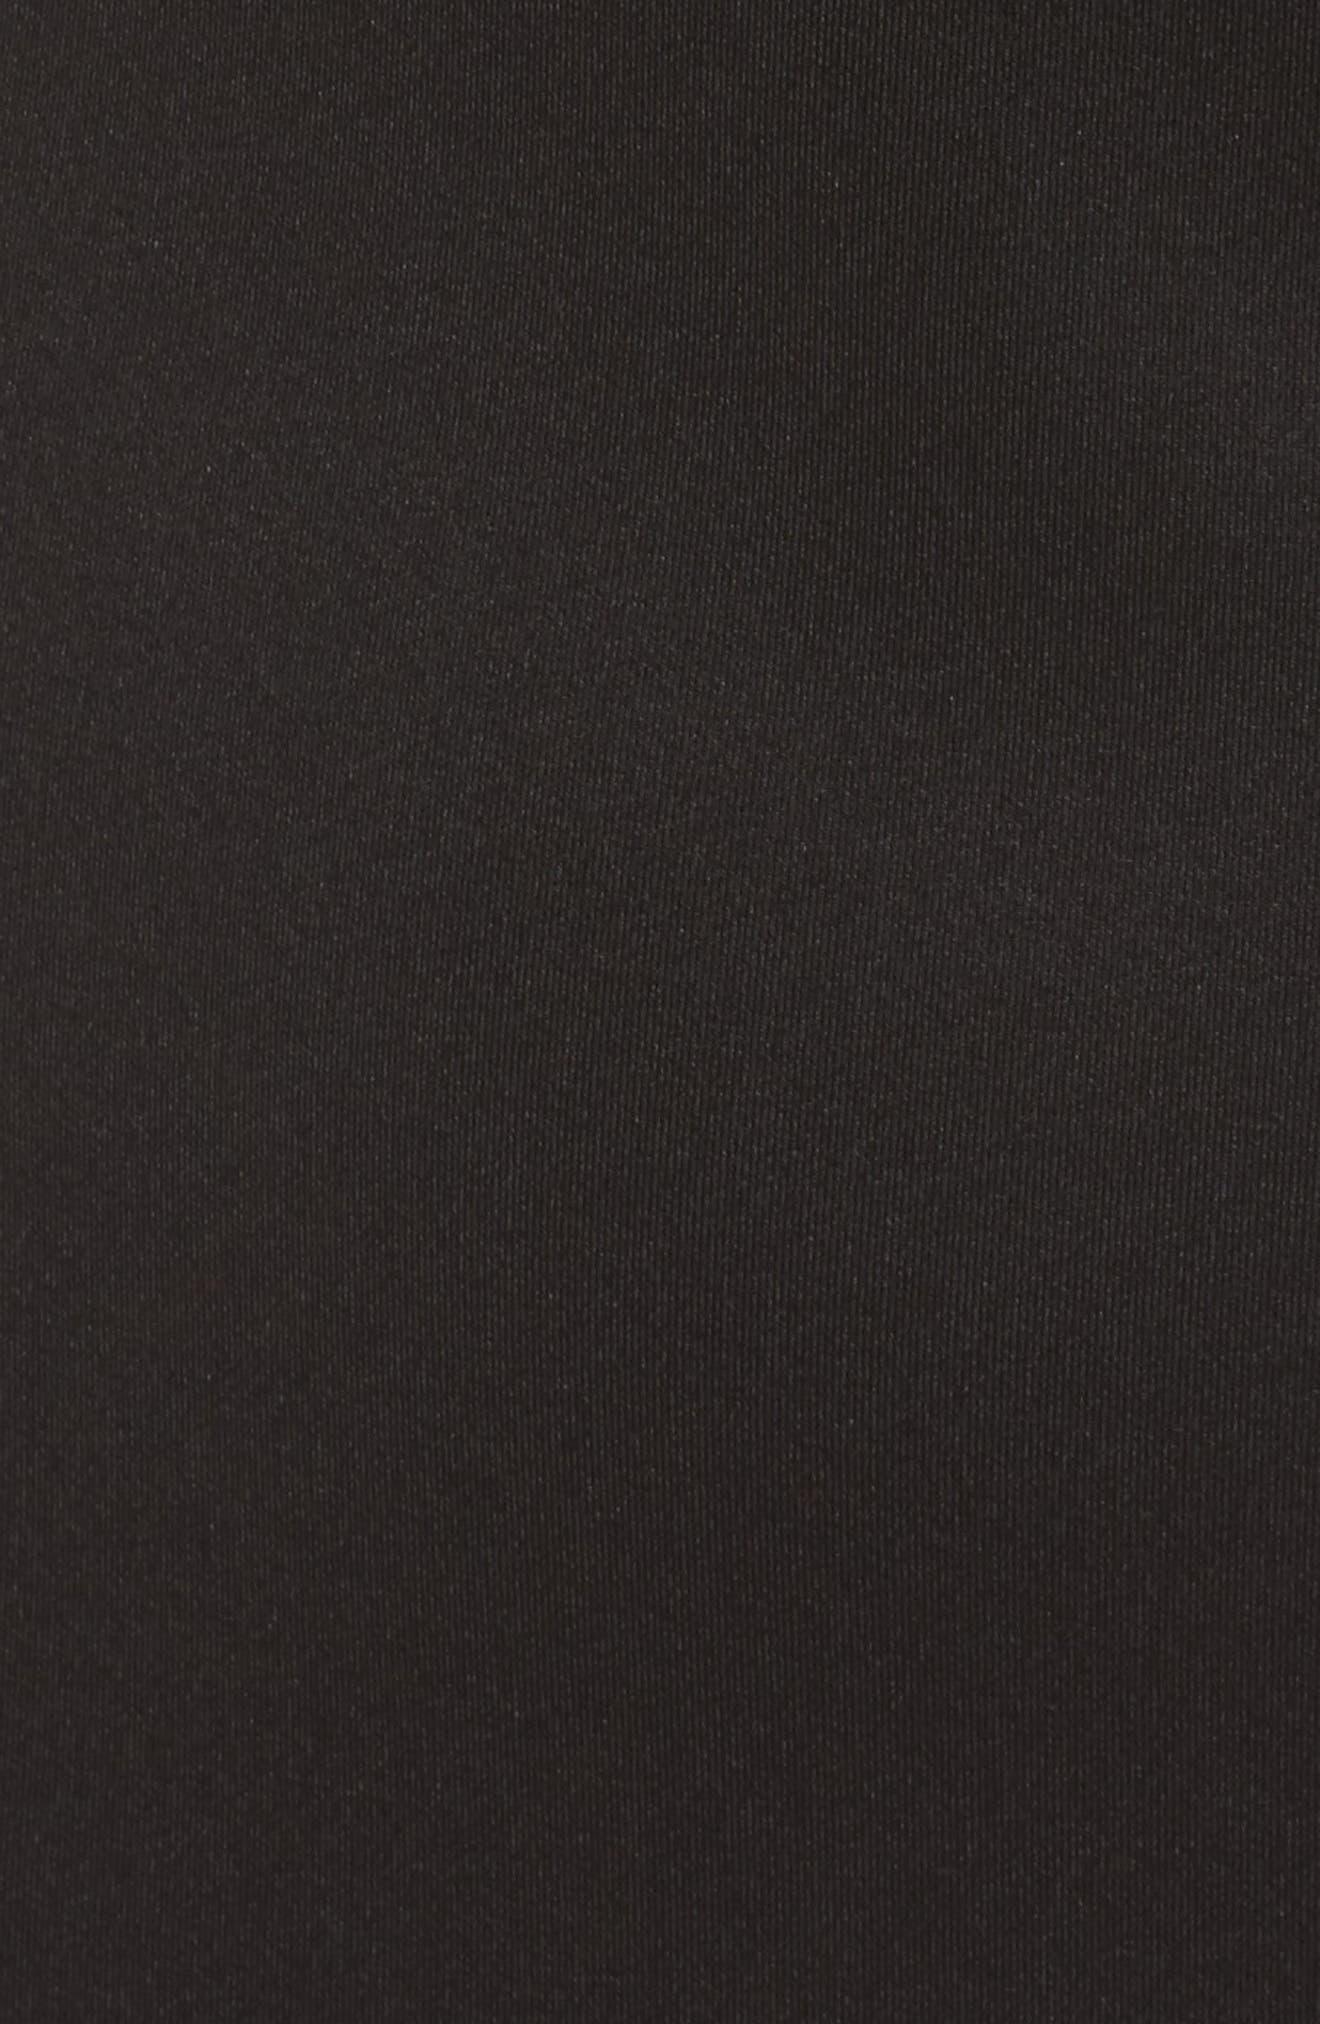 One-Shoulder Asymmetric Dress,                             Alternate thumbnail 5, color,                             001